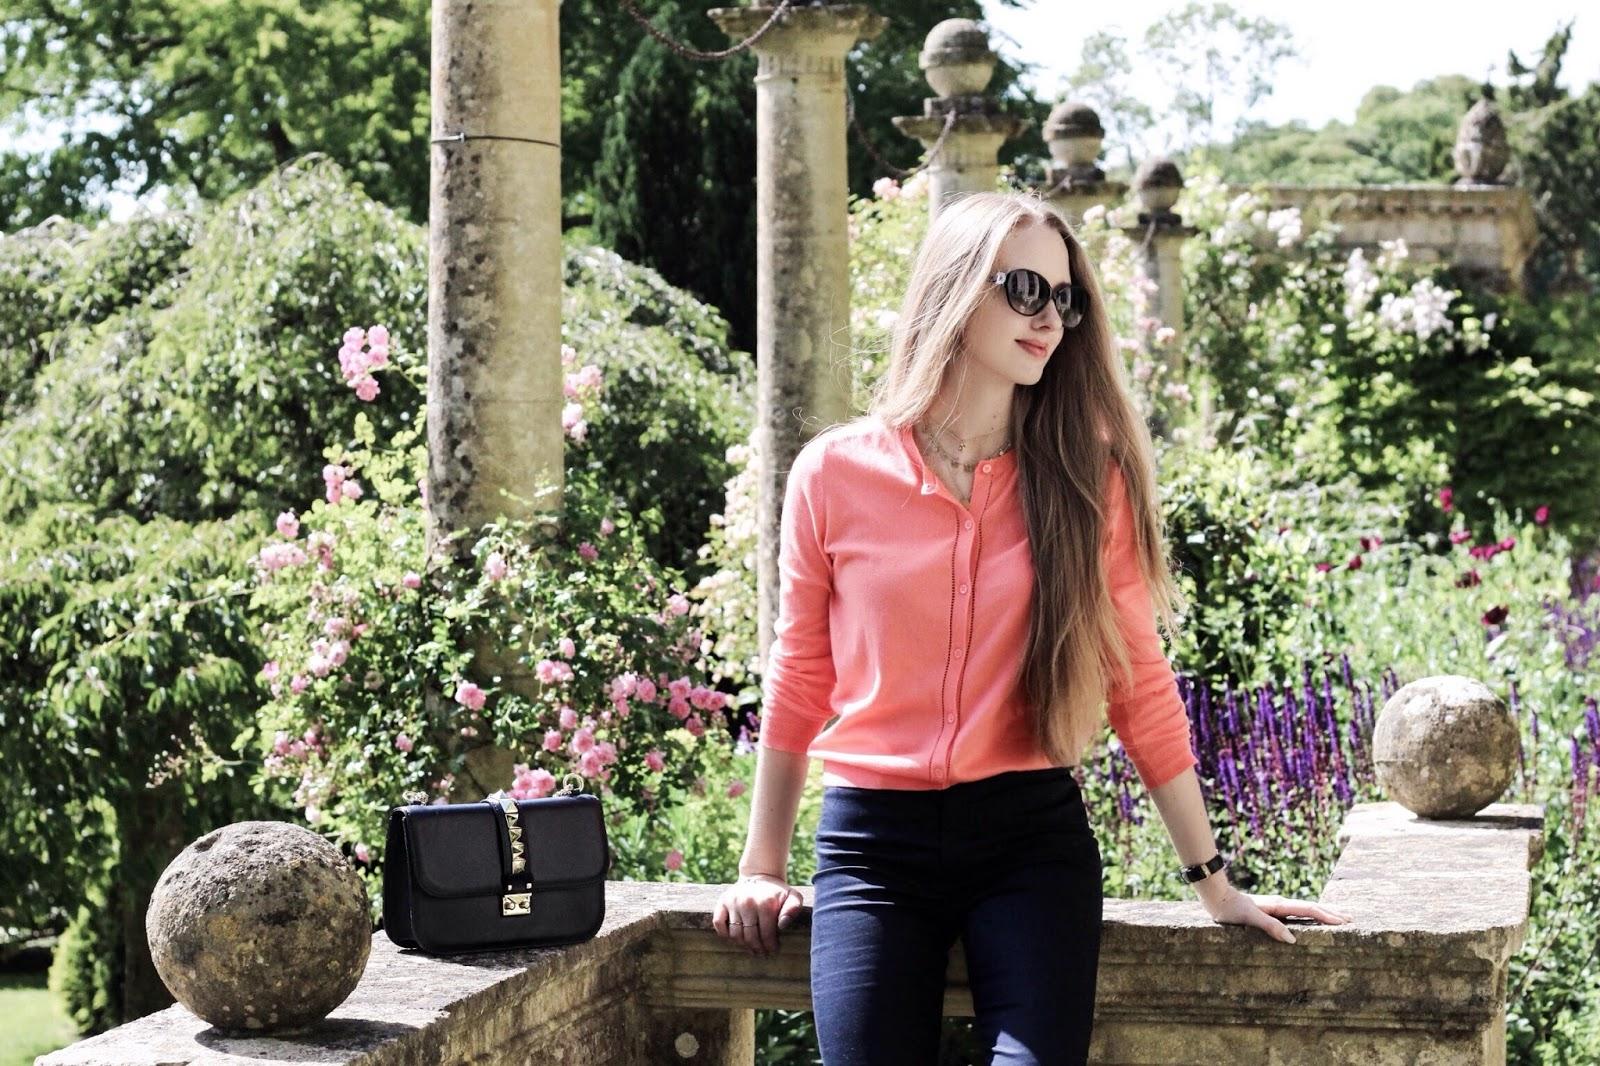 Beautiful UK Landscaped Gardens Flowers and Pillars